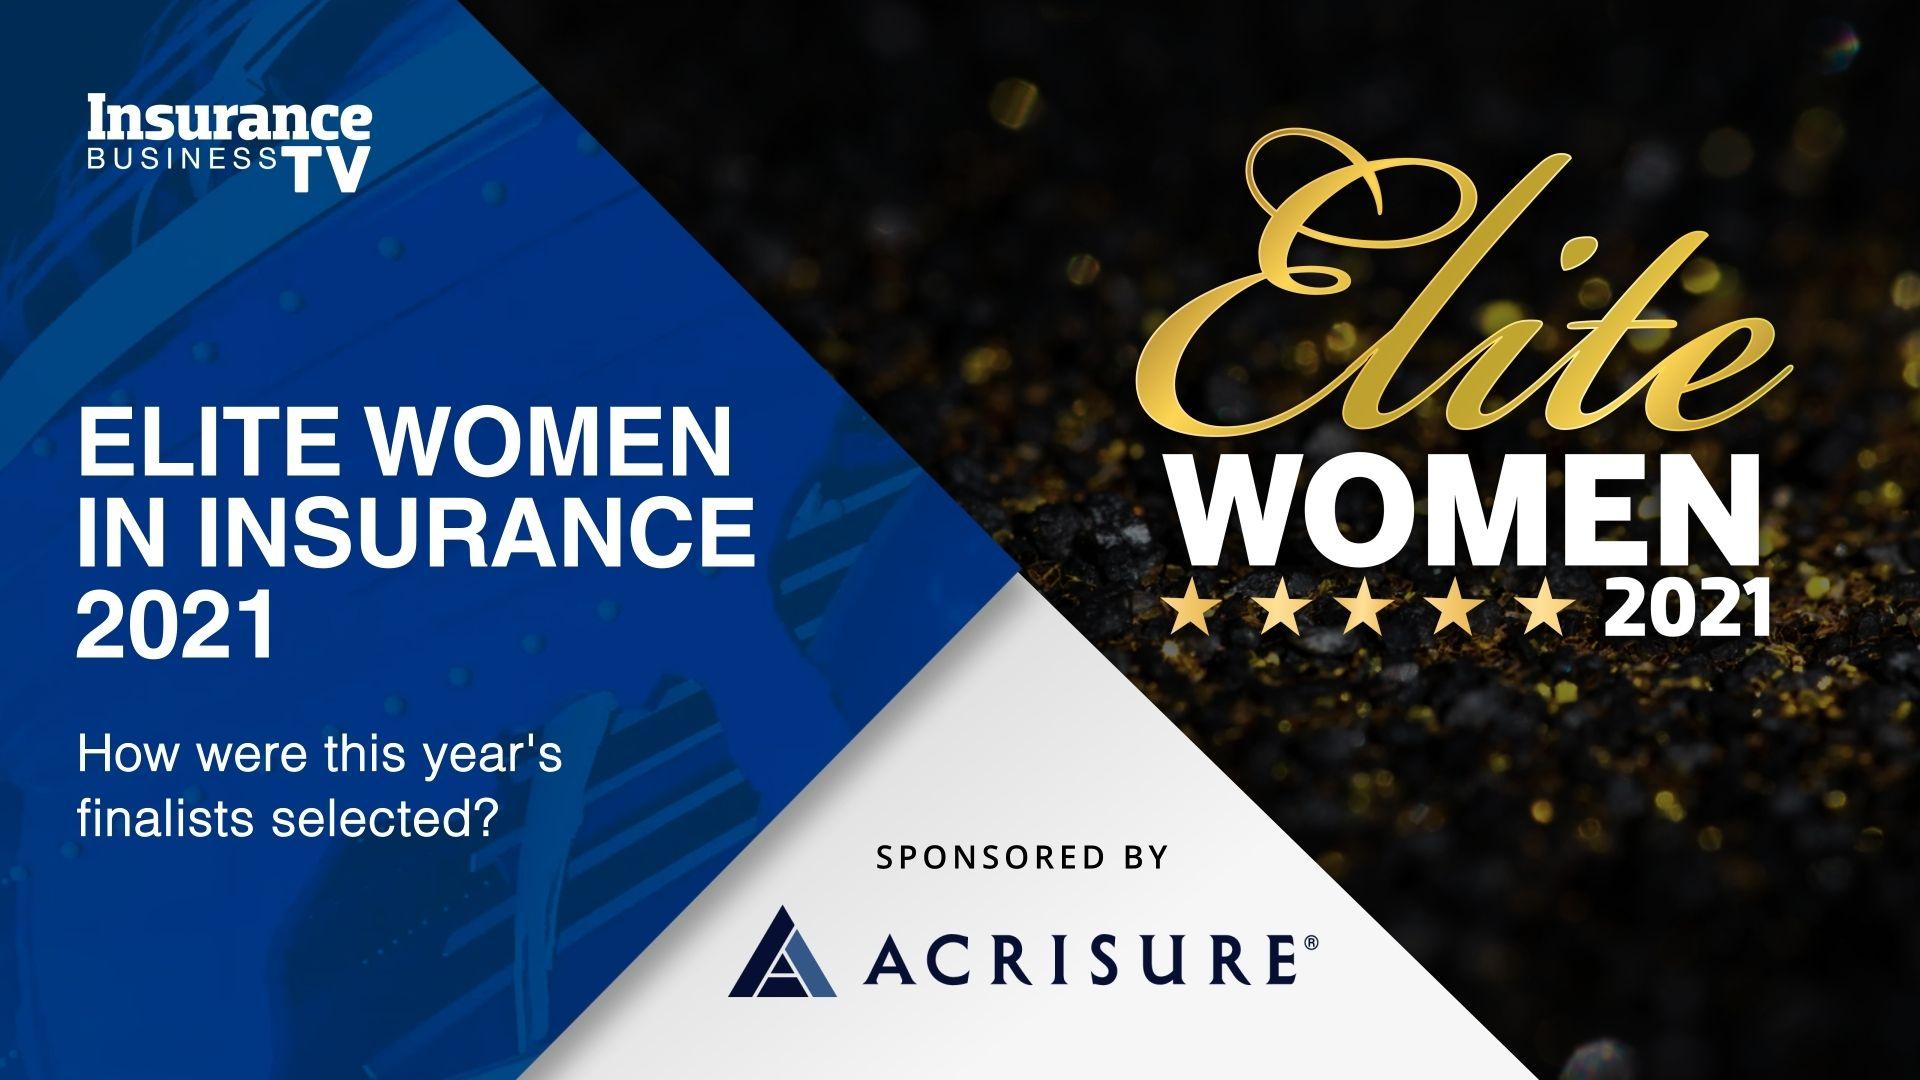 Insurance Business presents Elite Women 2021